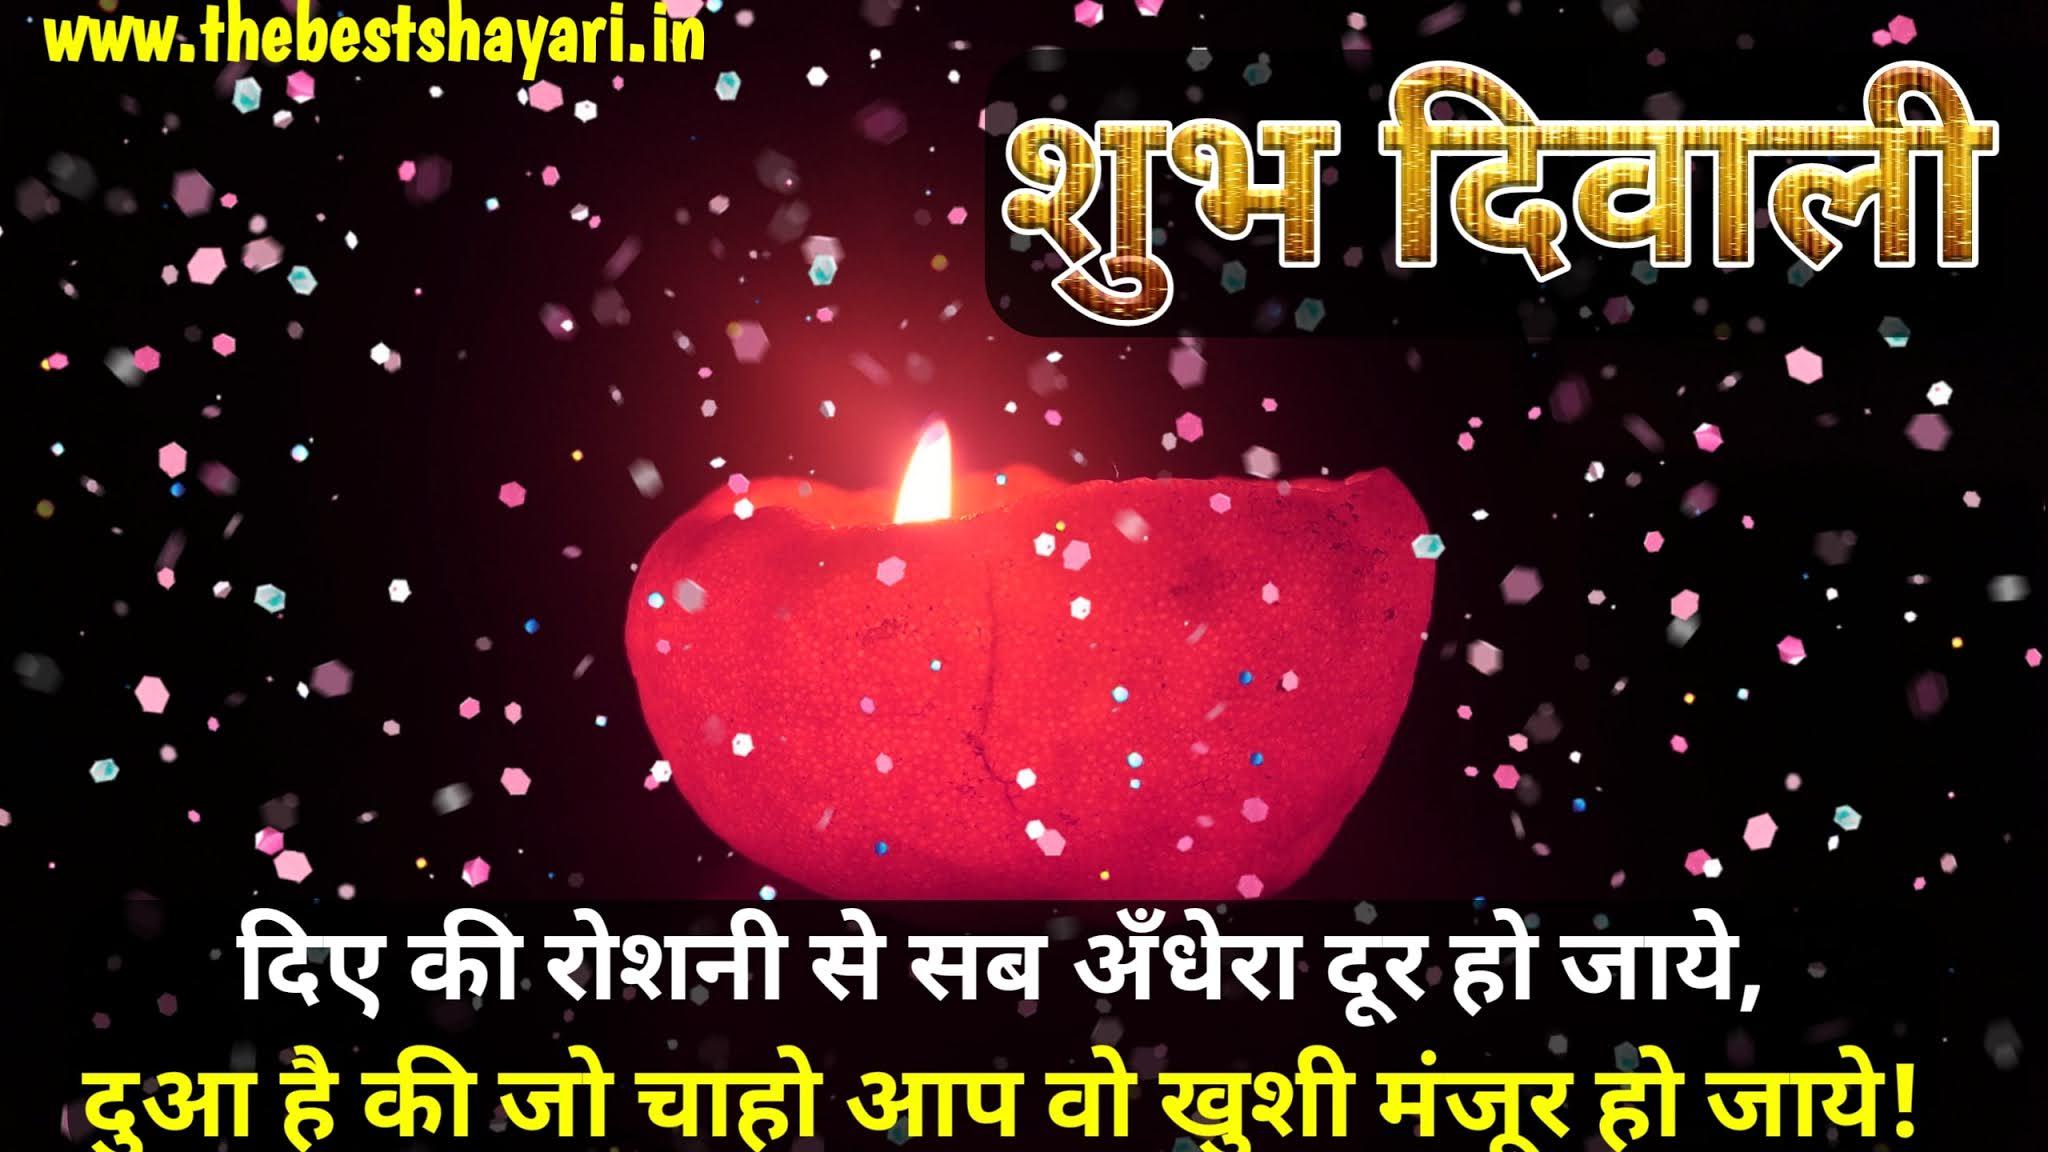 photos of happy diwali wishes